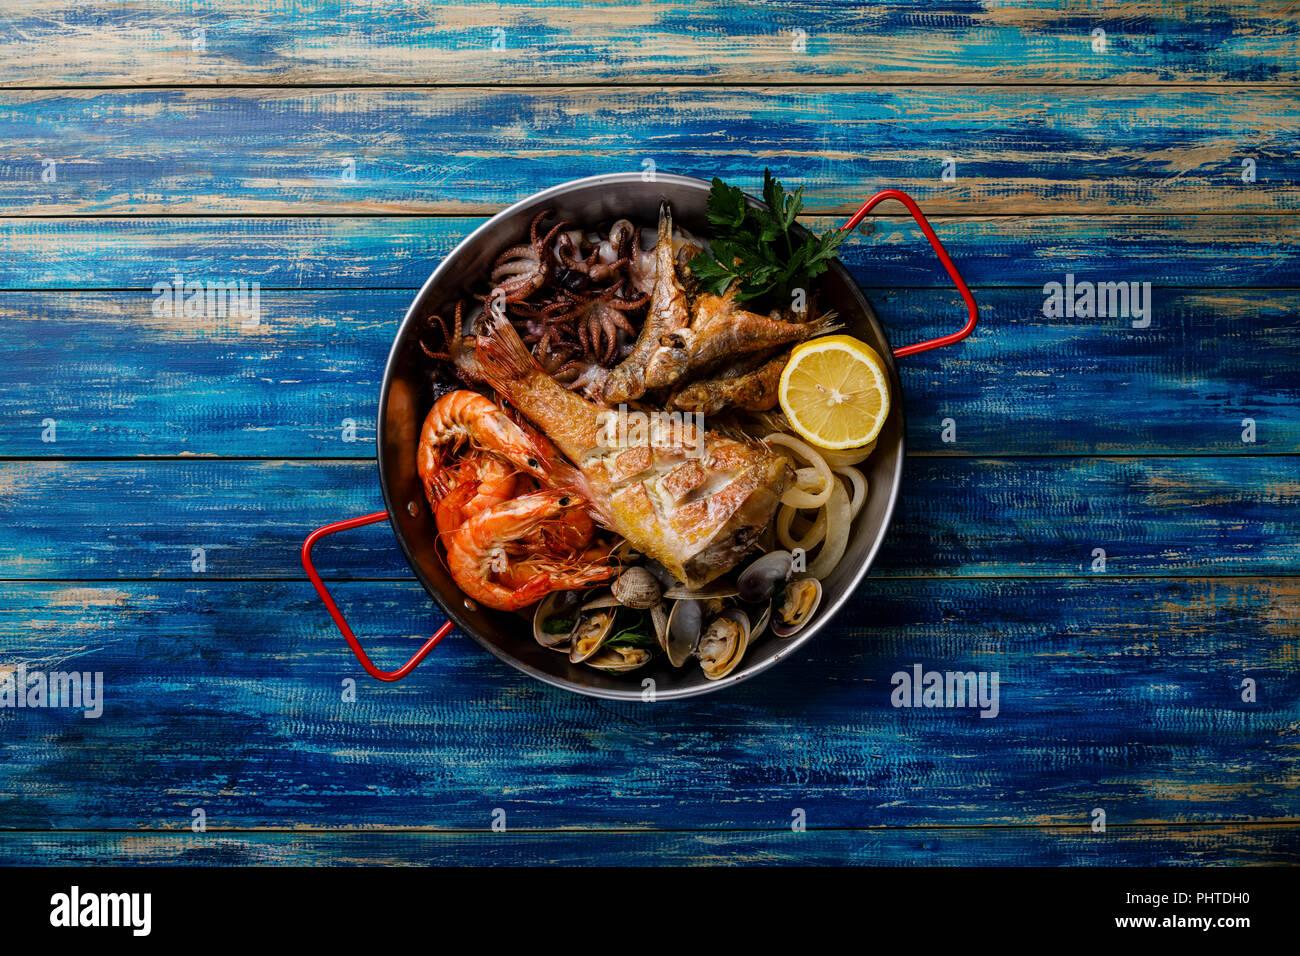 Seafood assorted platter - Prawn Shrimp, Vongole Clams, Squid rings, Octopus mini, roast Mackerel, roasted Perch - Stock Image